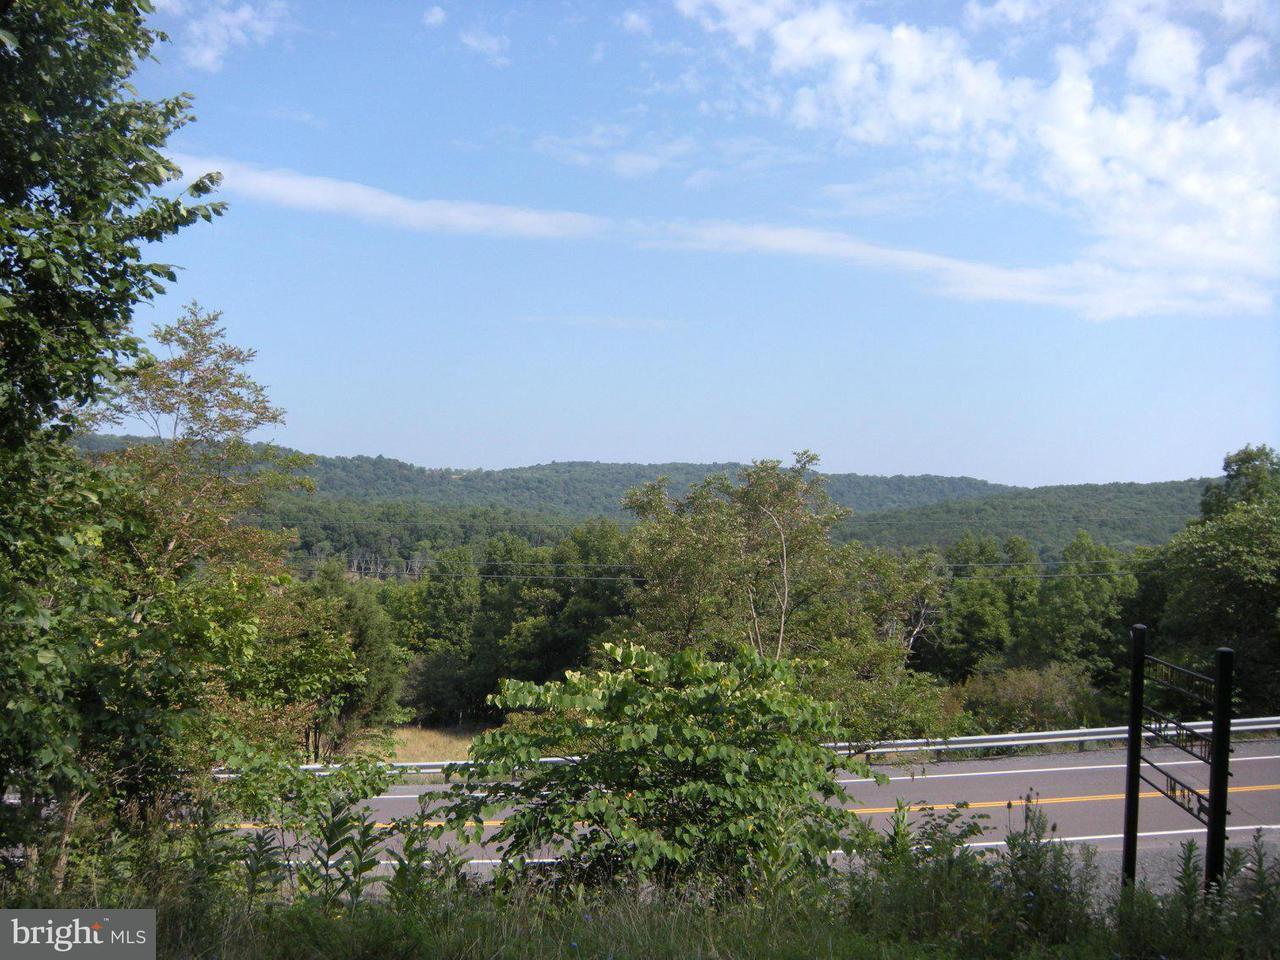 Land for Sale at 13 Horizon Ln Capon Bridge, West Virginia 26711 United States